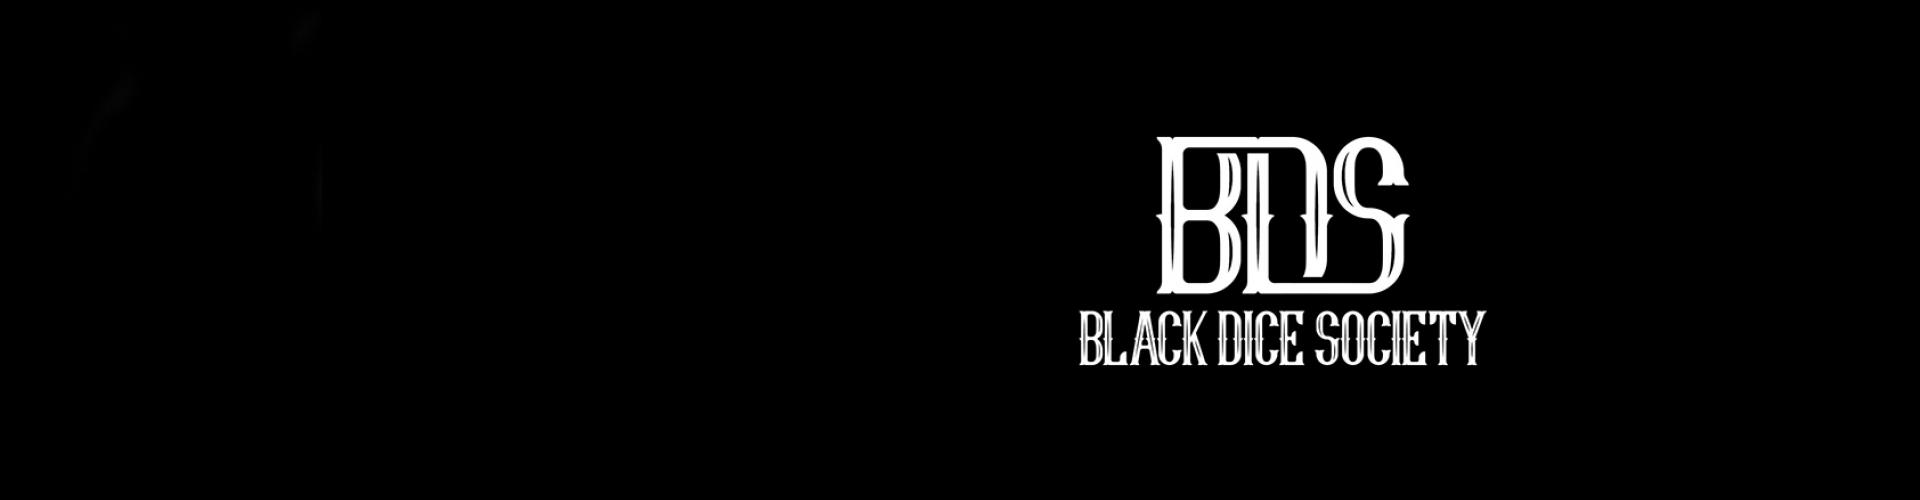 Black Dice Society